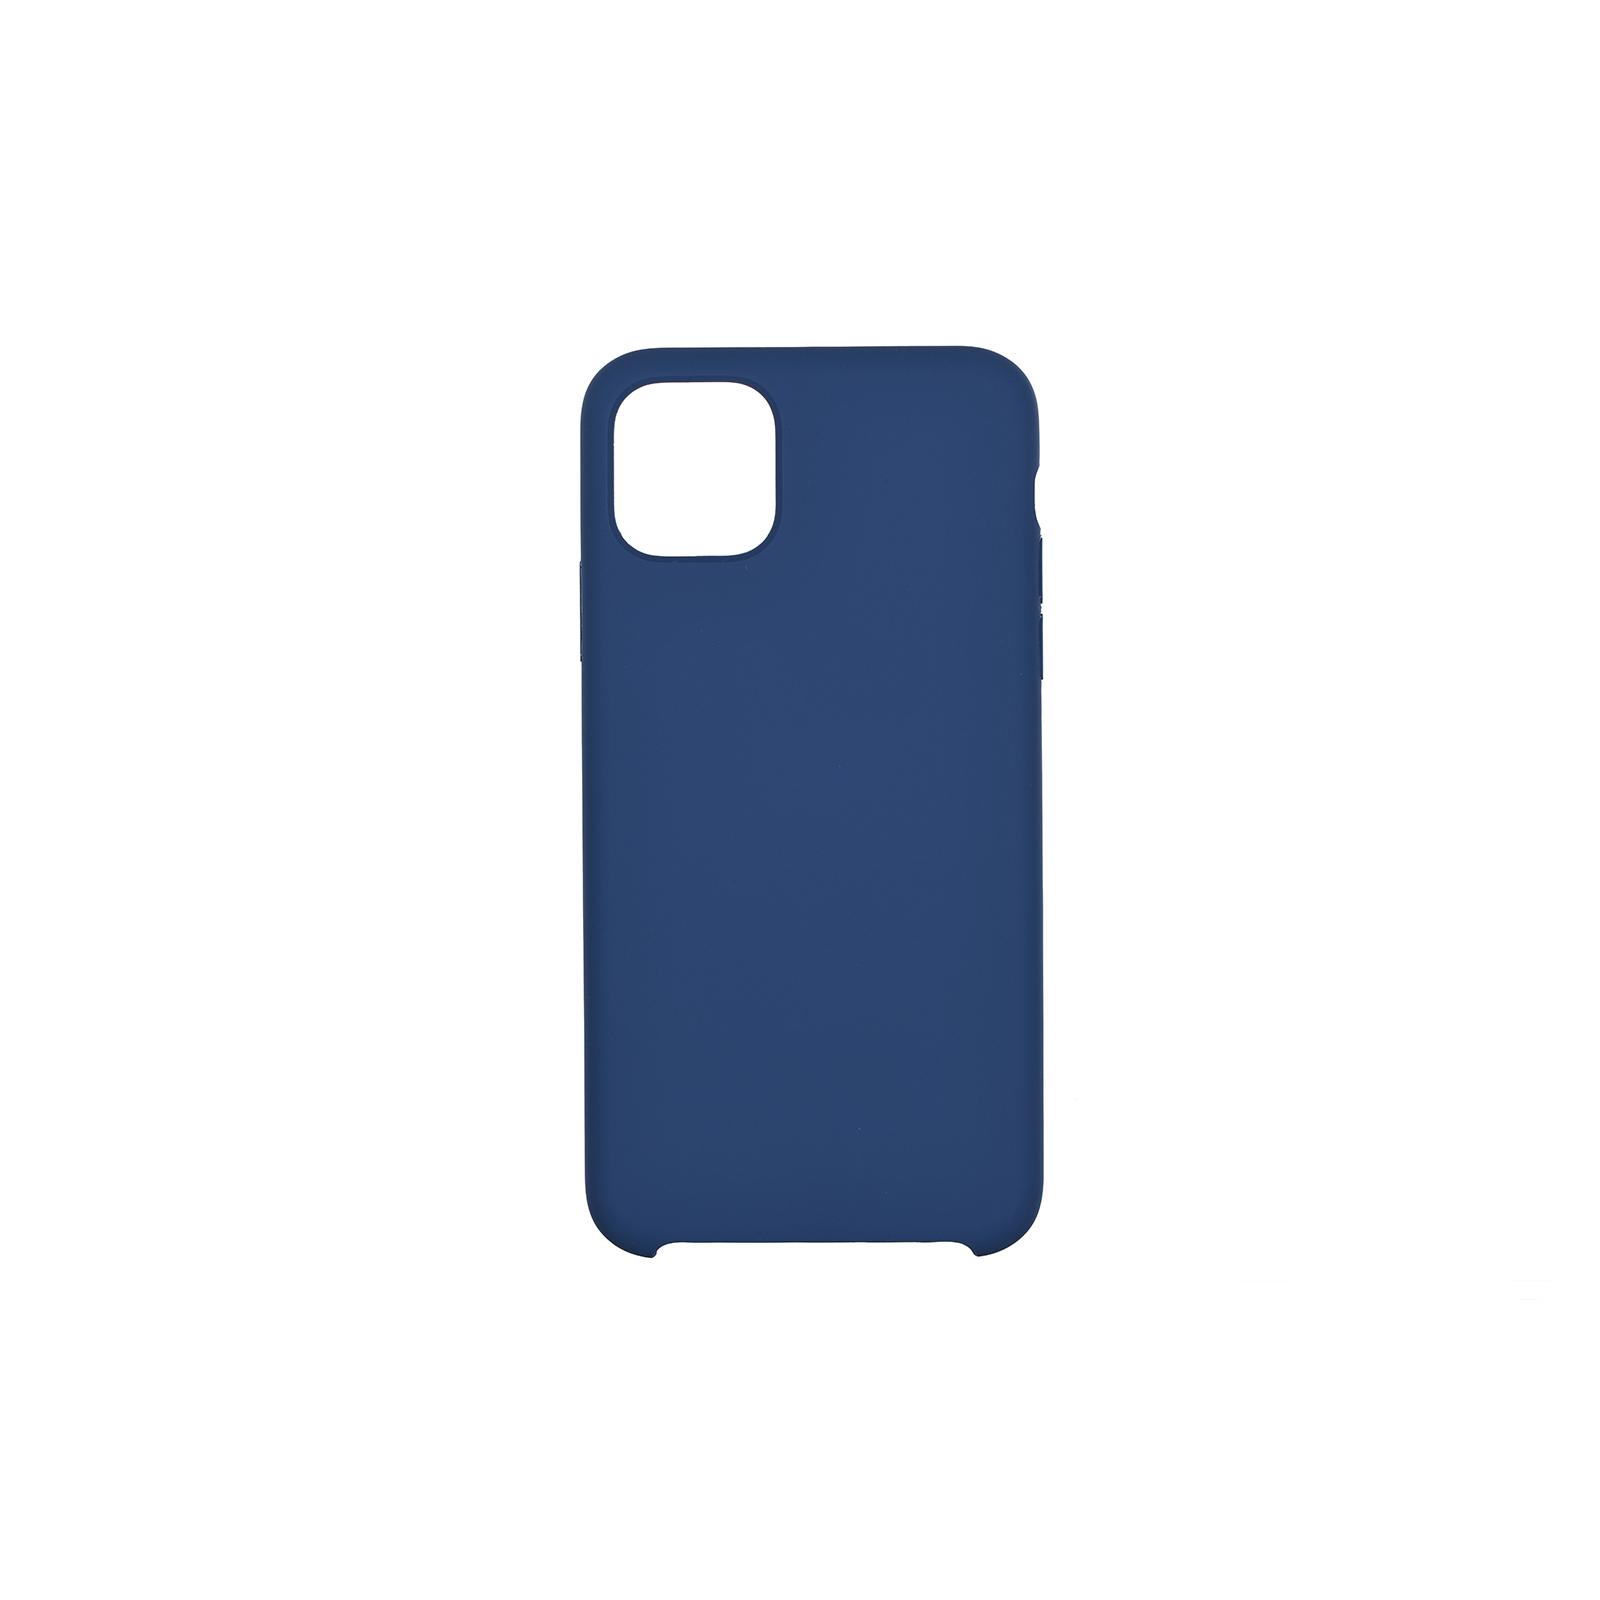 "Чехол для моб. телефона 2E Apple iPhone 11 (6.1""), Liquid Silicone, Navy (2E-IPH-11-OCLS-NV)"